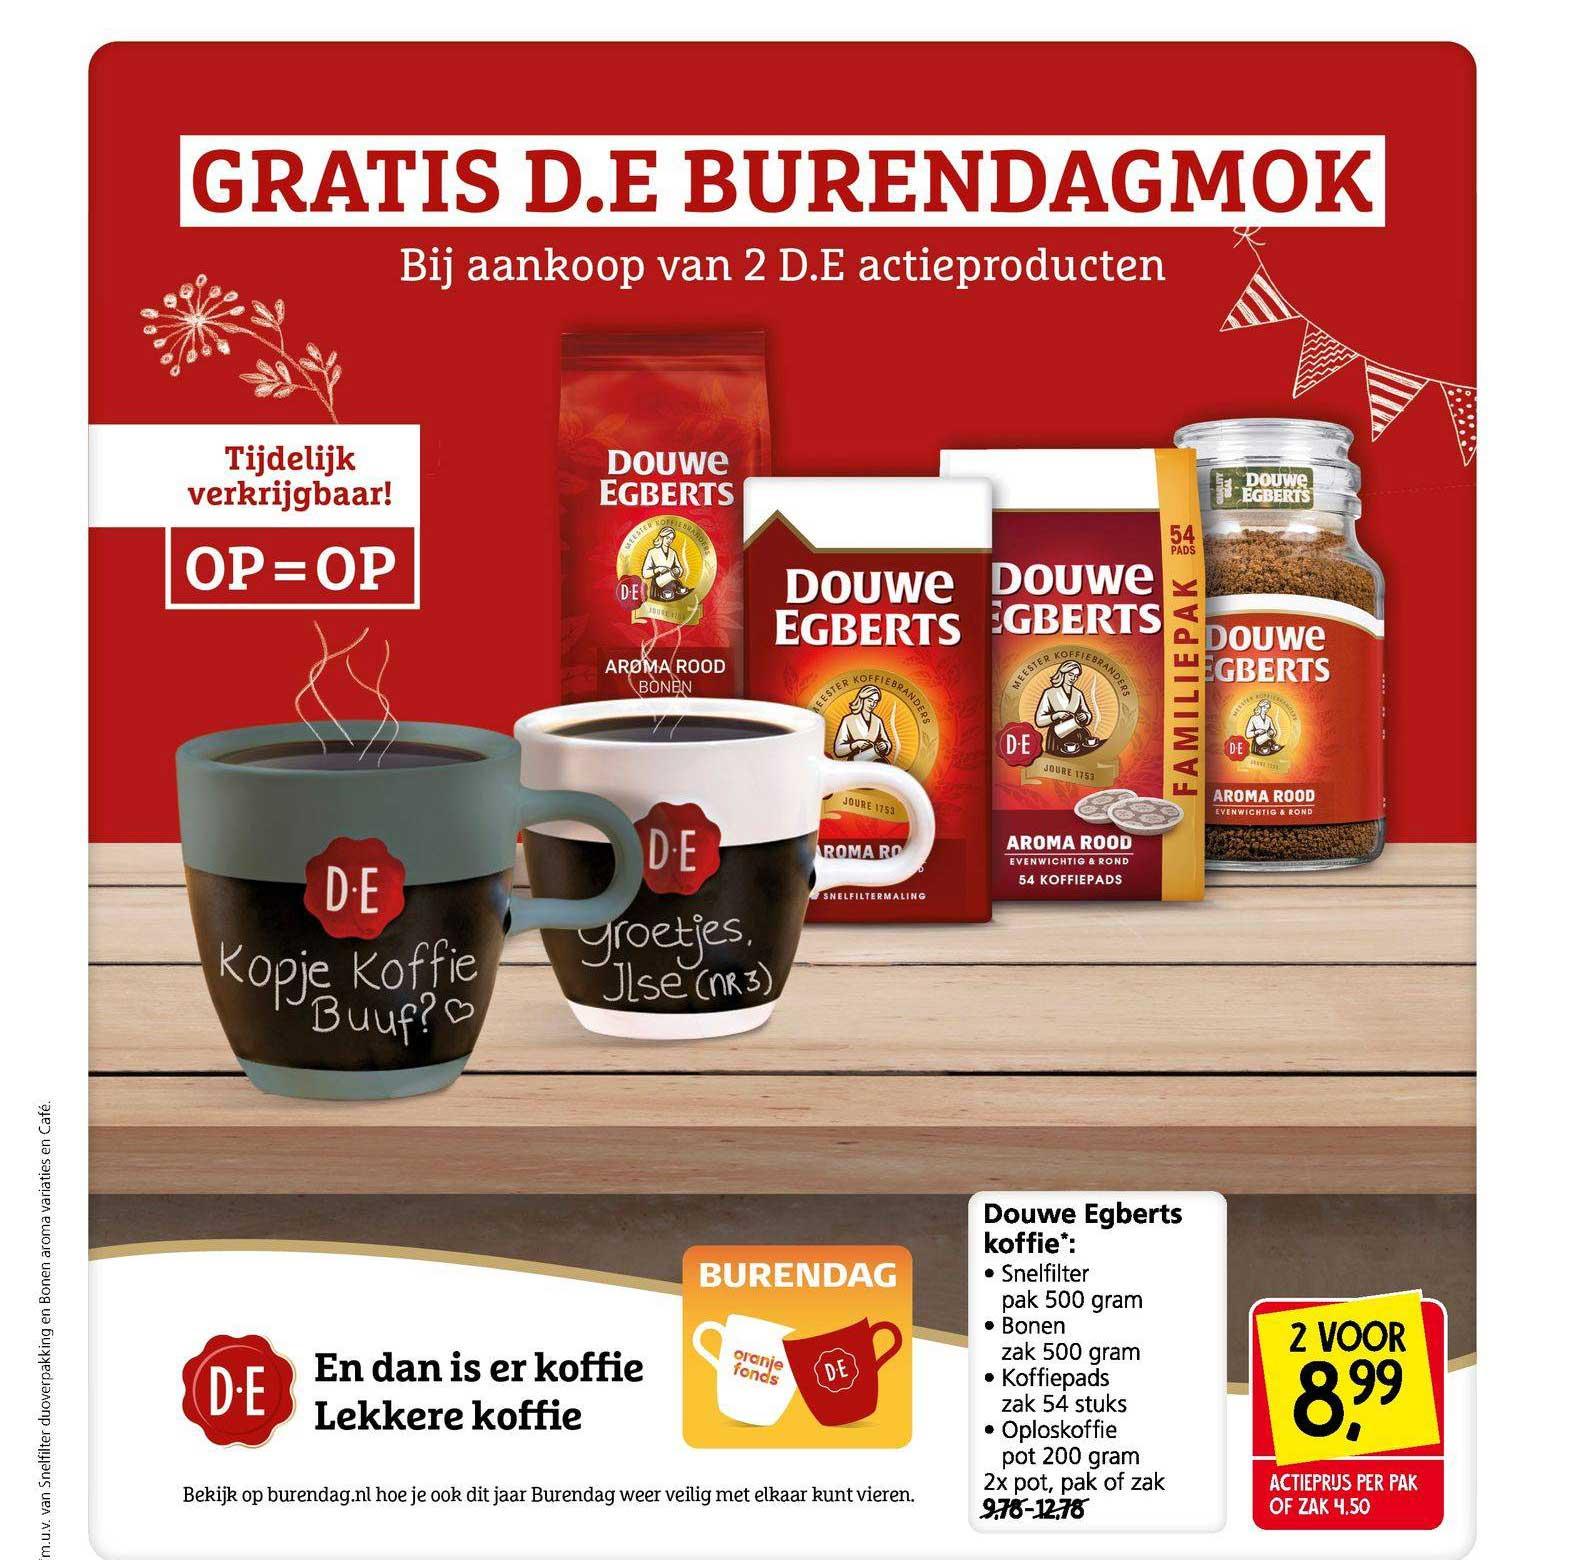 Jan Linders Douwe Egberts Koffie : Snelfilter, Bonen, Koffiepads Of Oploskoffie